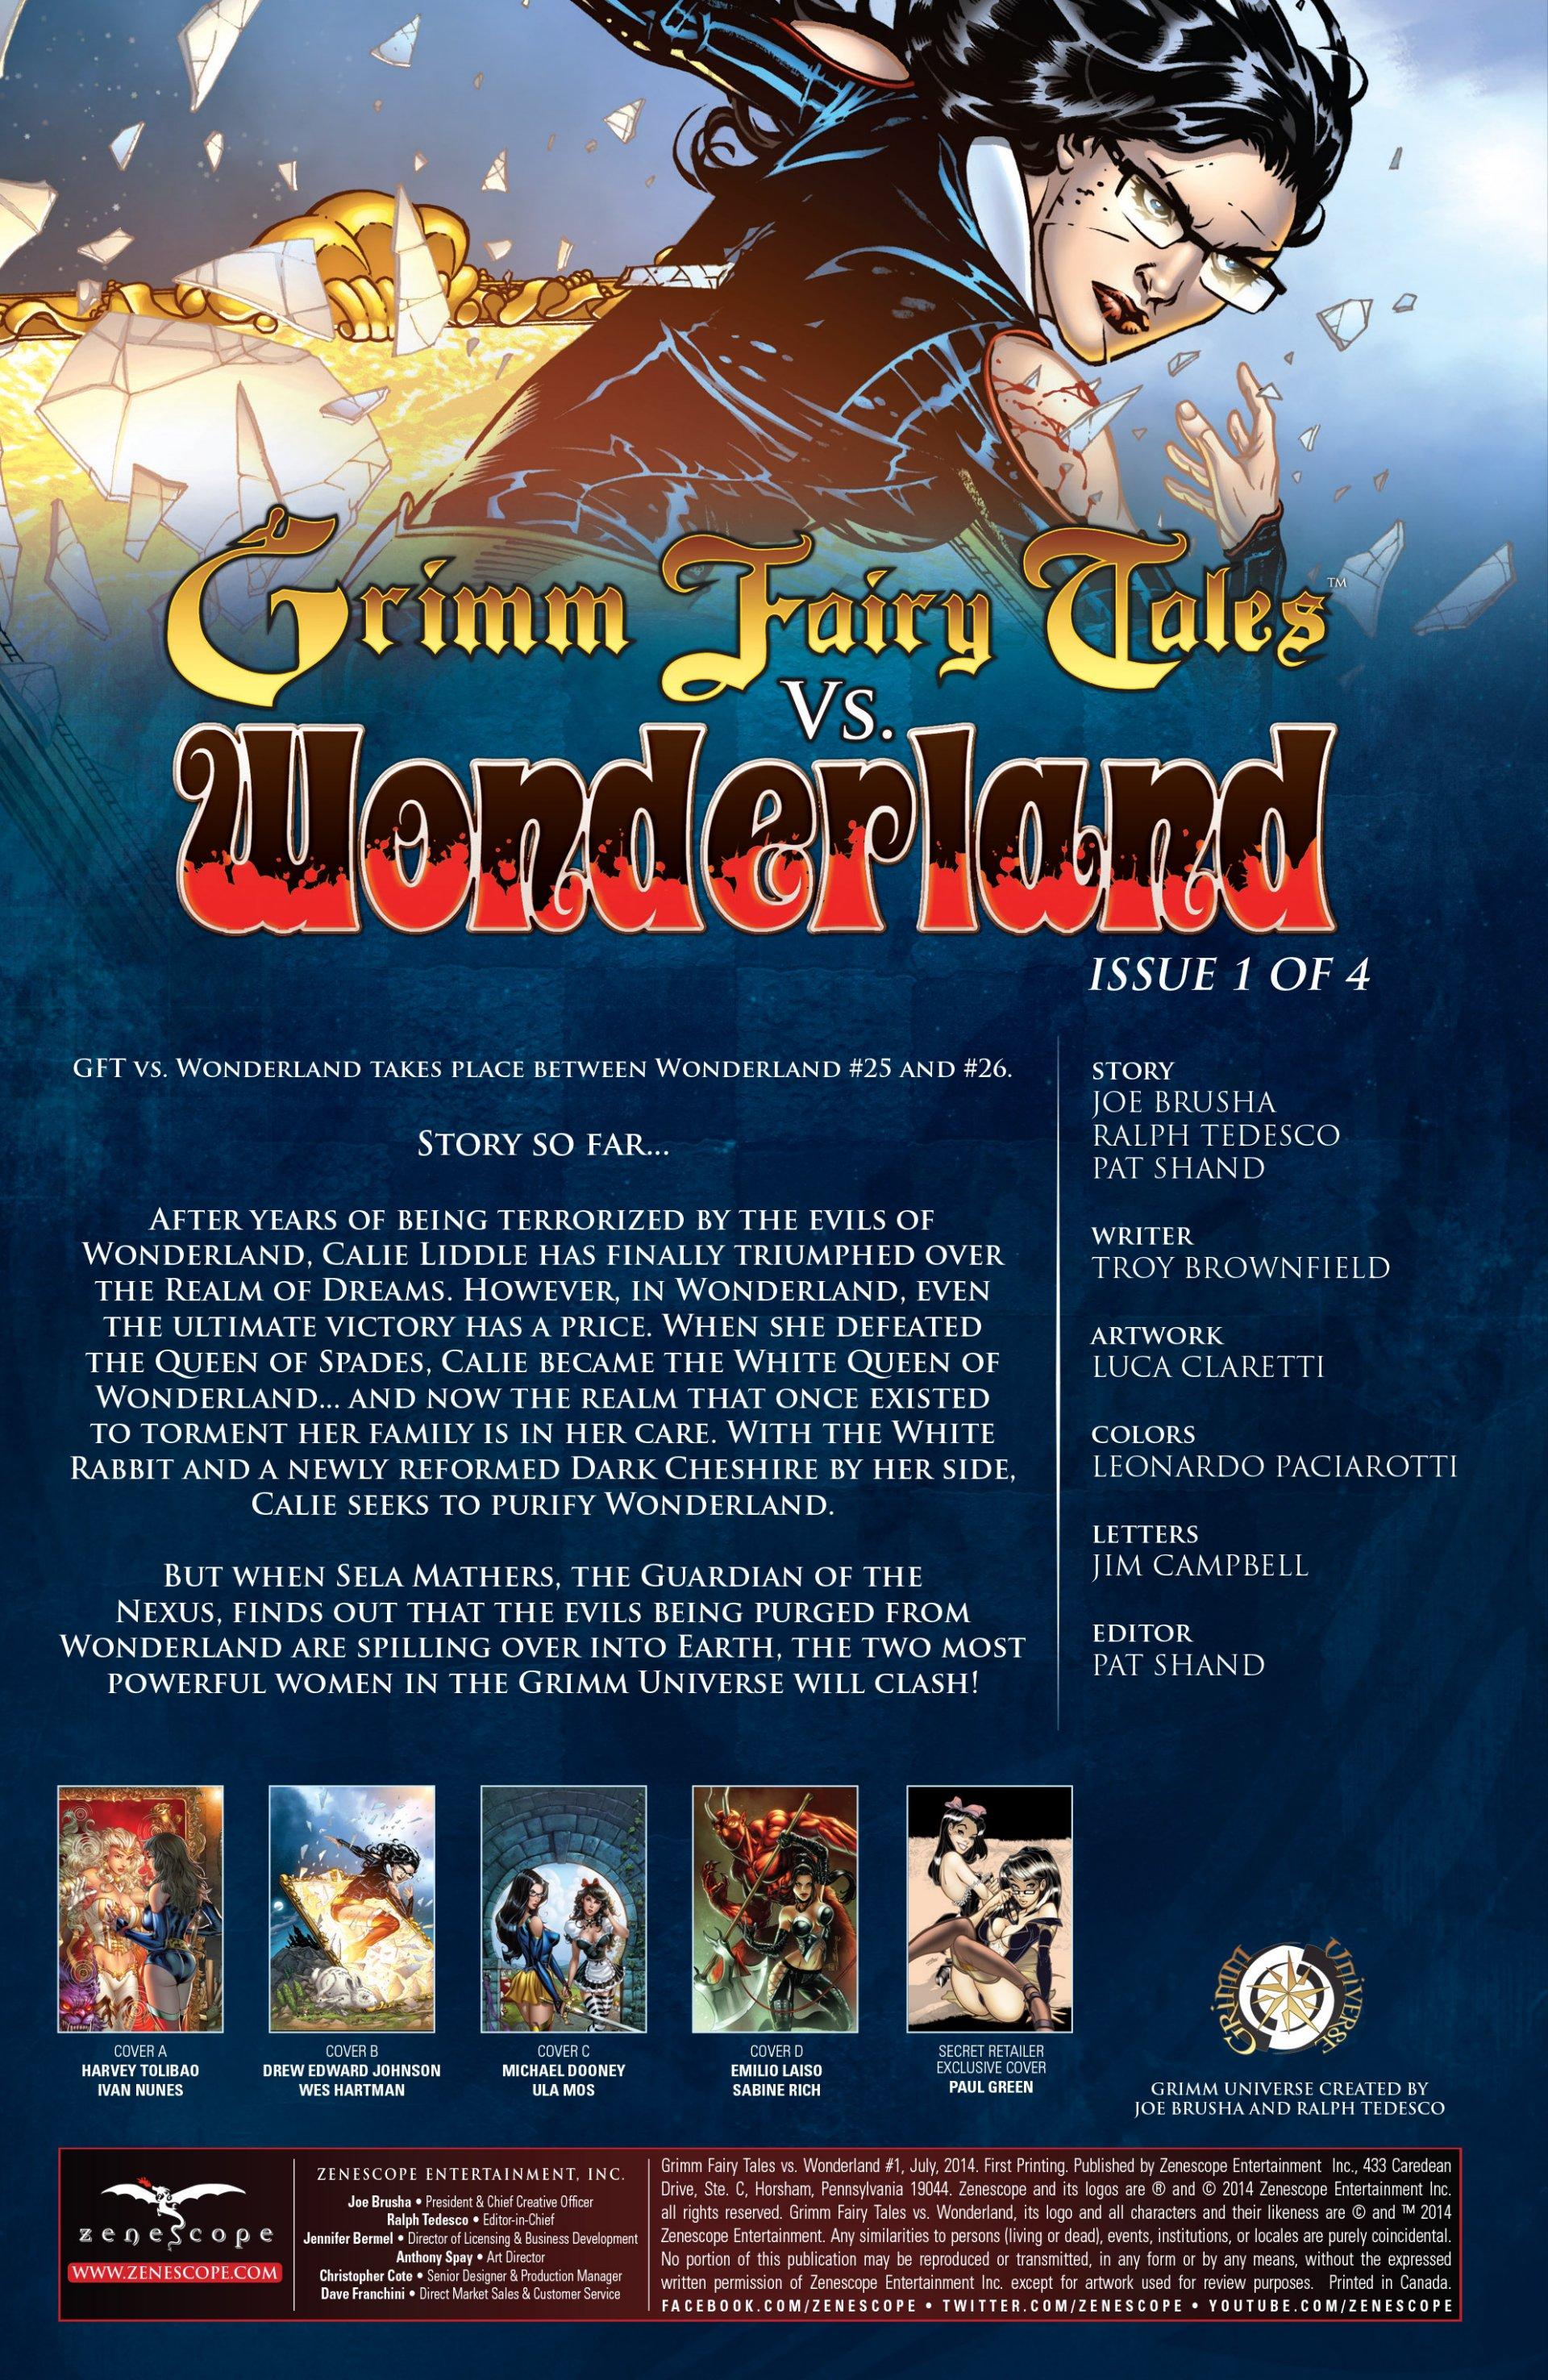 Read online Grimm Fairy Tales vs. Wonderland comic -  Issue #1 - 3